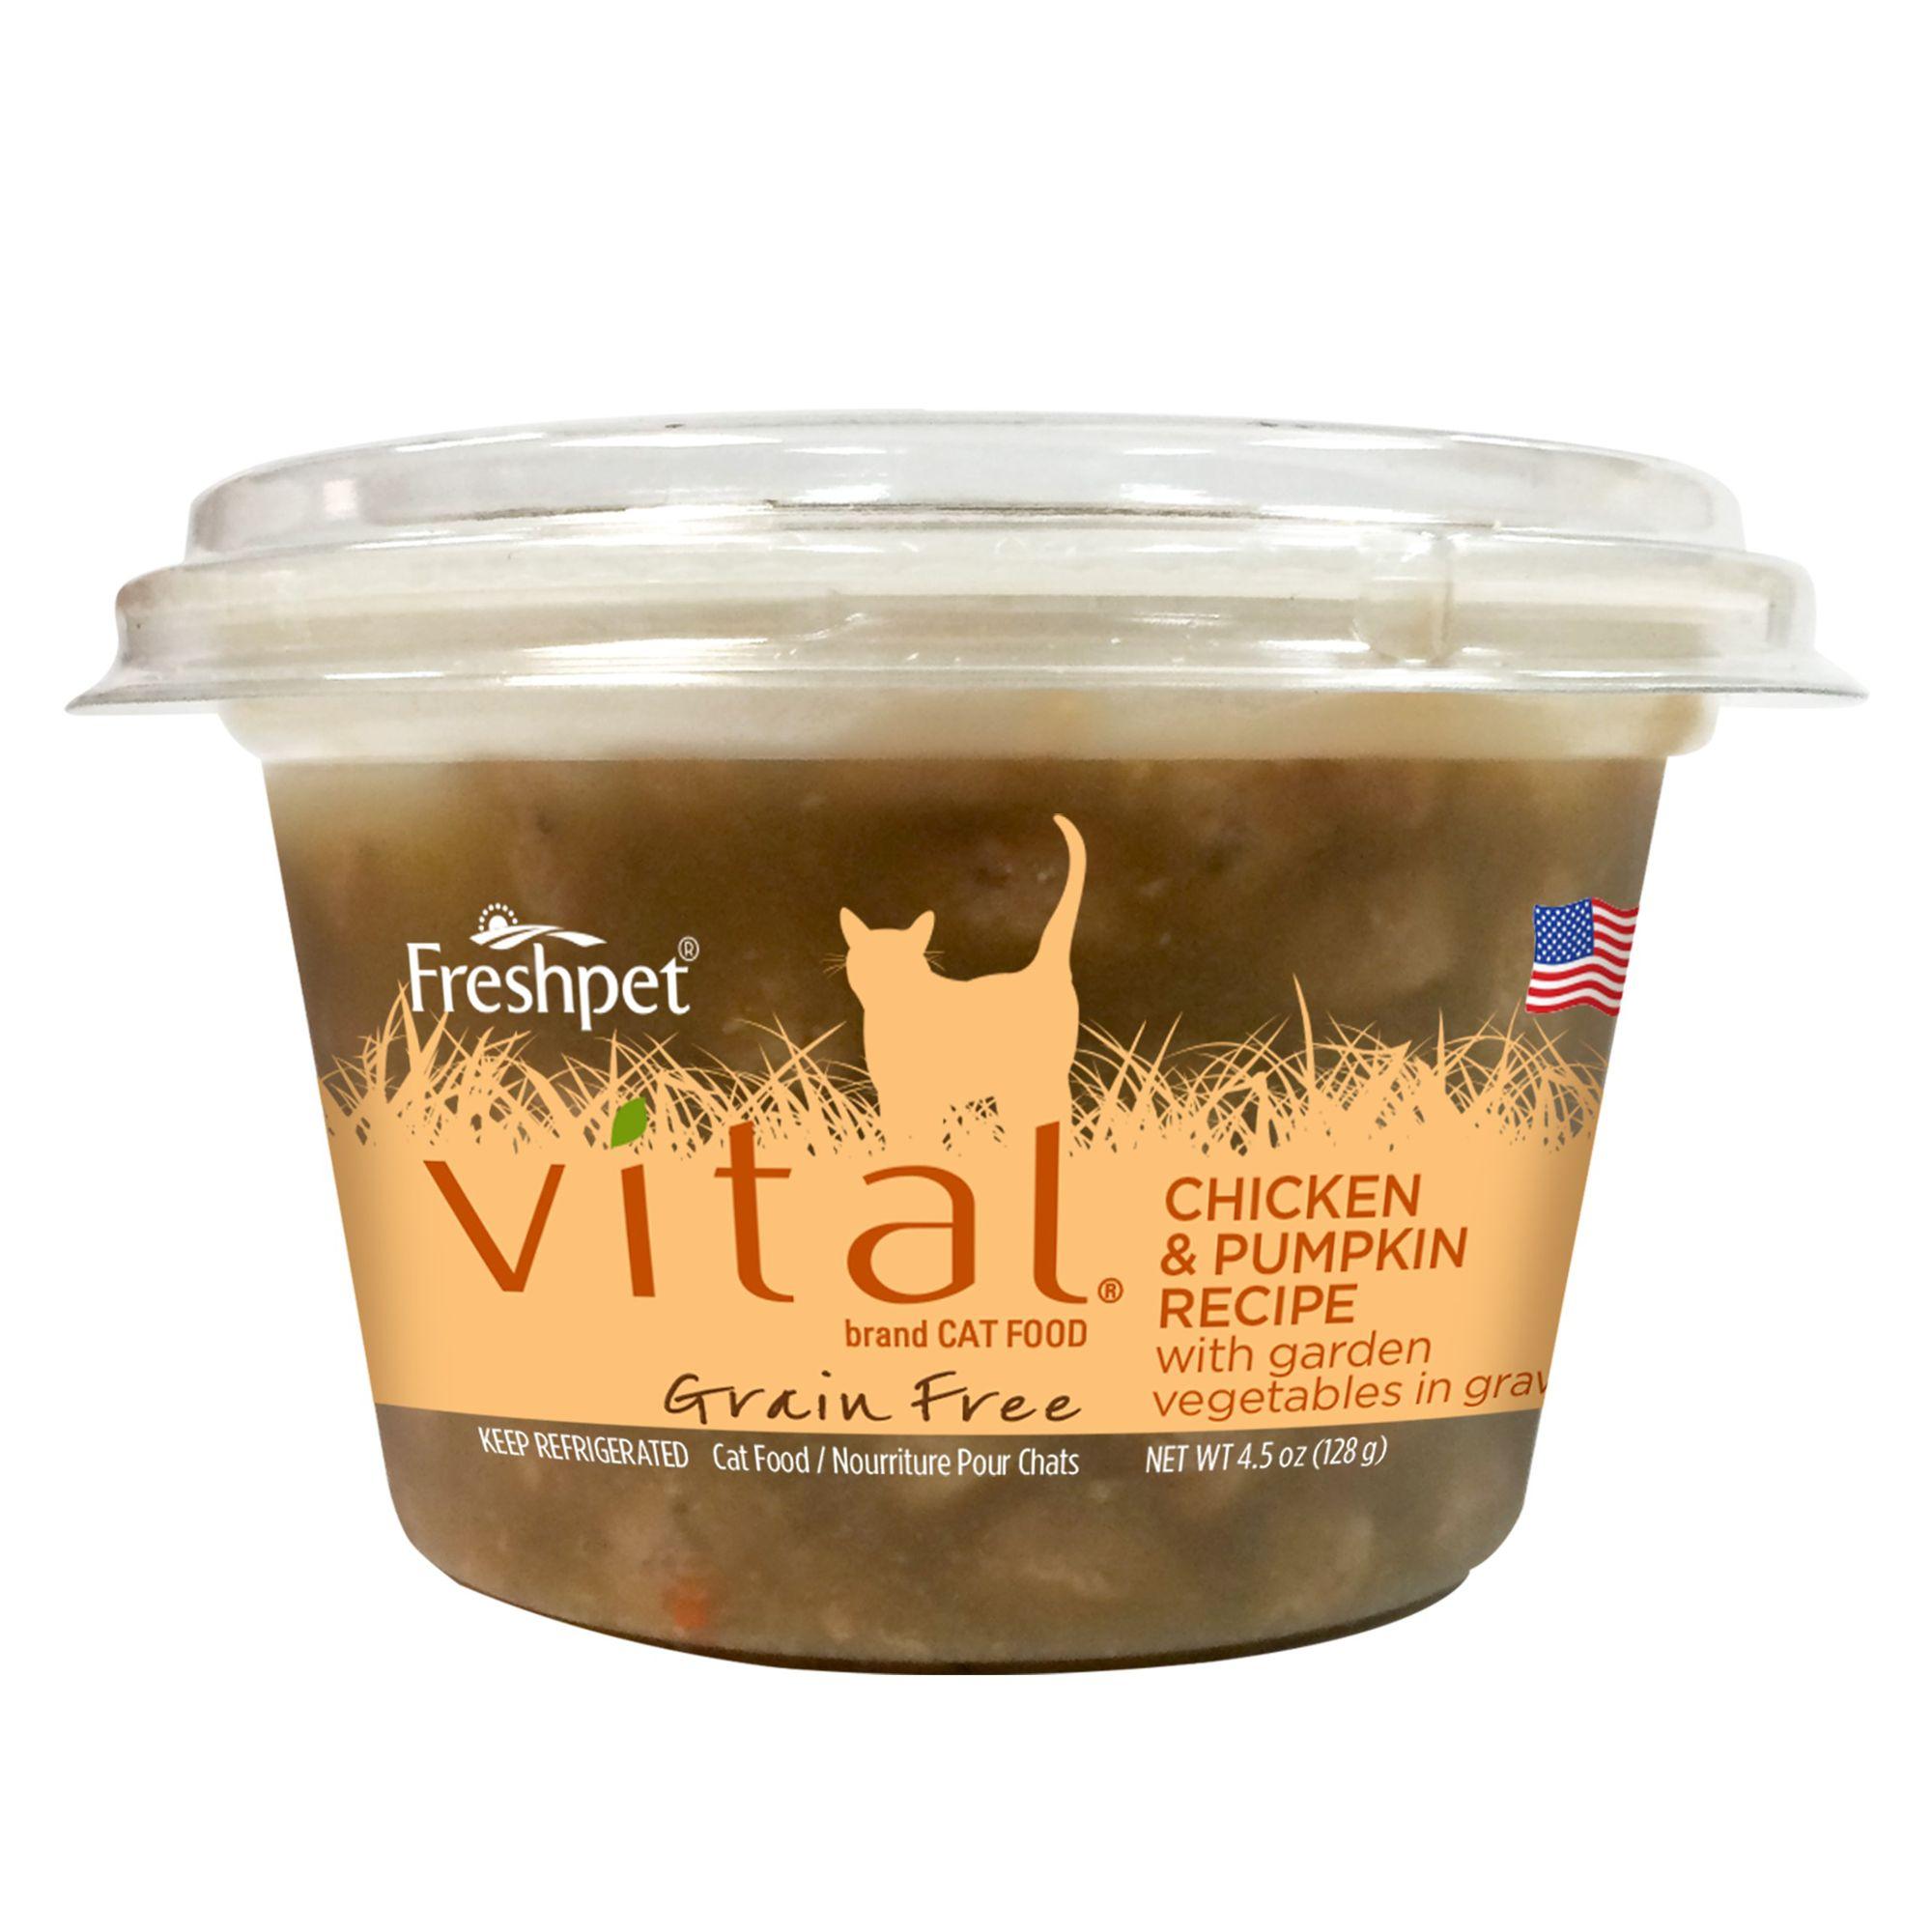 Freshpet Vital Cat Food Grain Free Chicken And Pumpkin Size 4.5 Oz